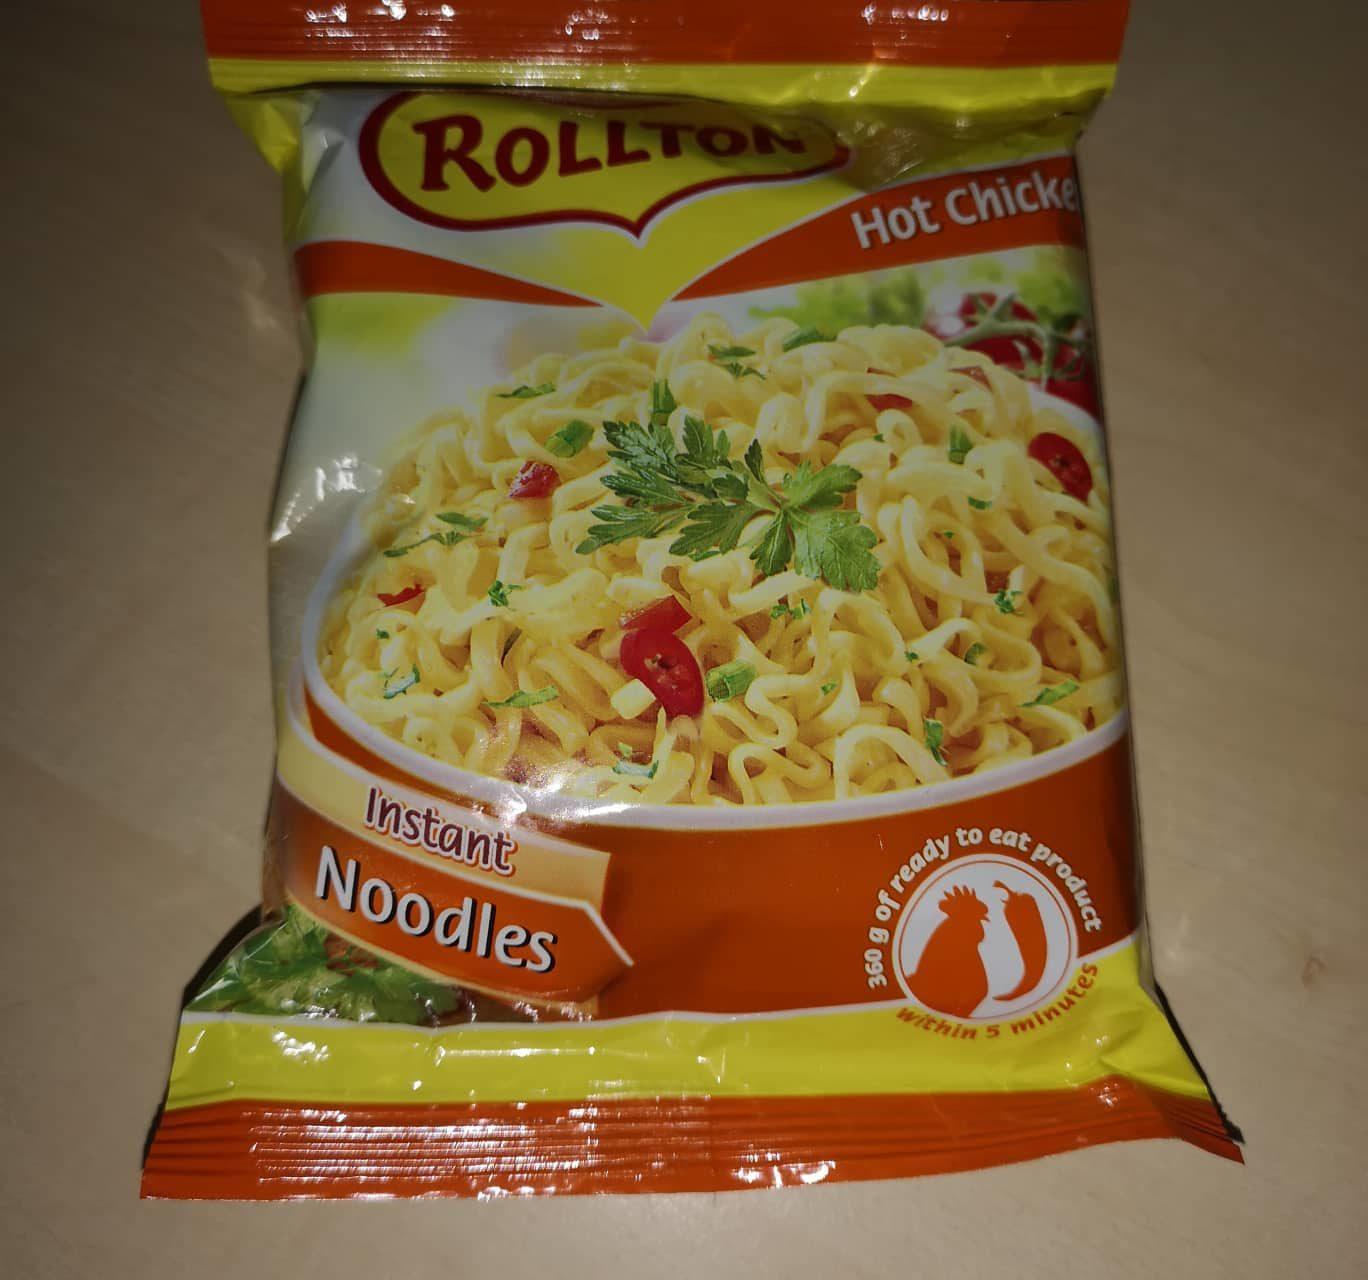 "#714: Rollton Instant Noodles ""Hot Chicken Flavour"""